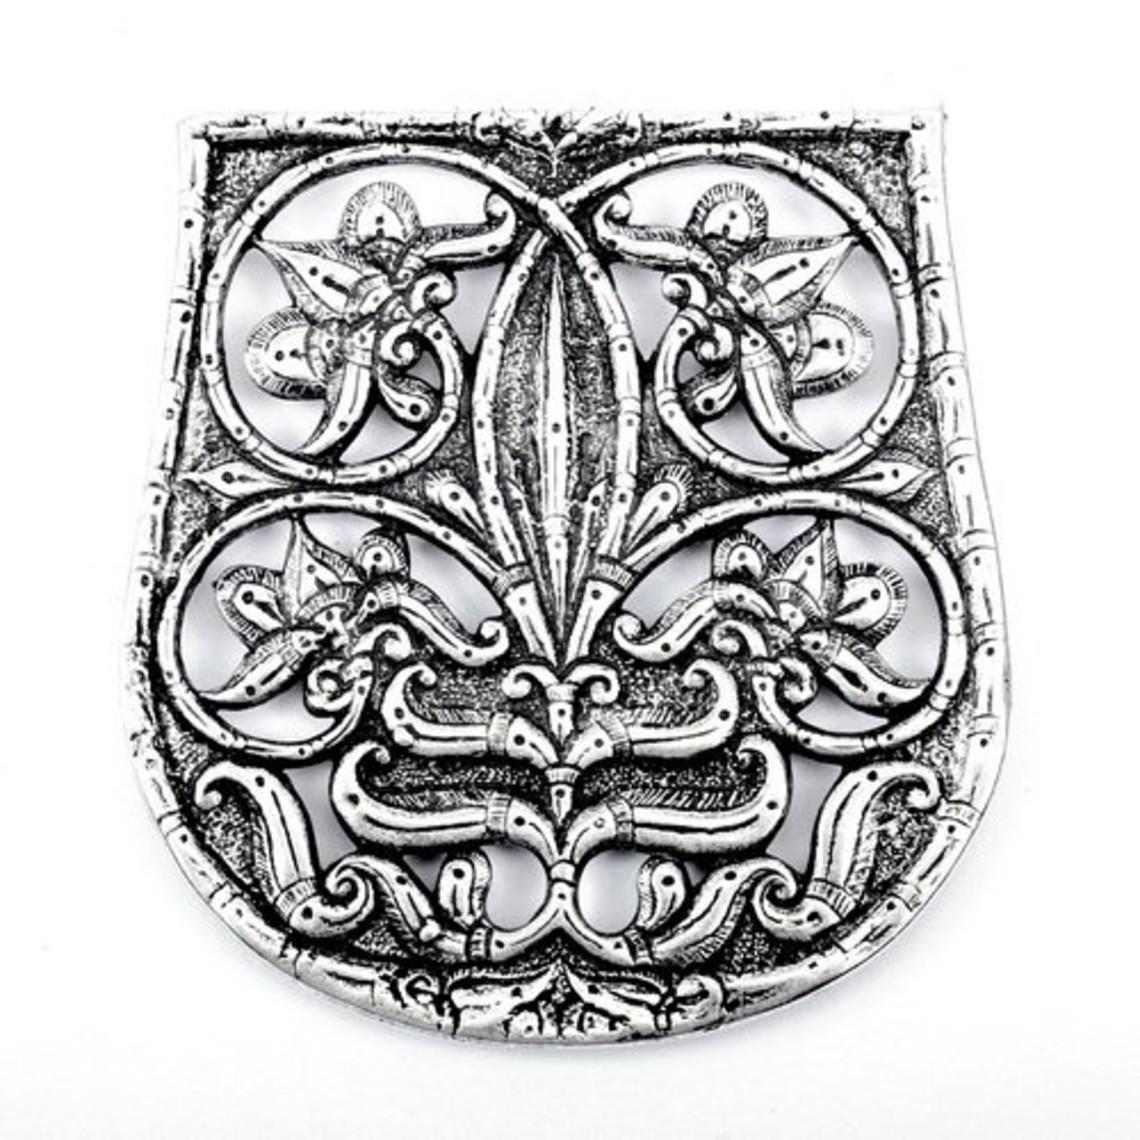 10th century bag decoration Karos-Eperjesszög, silvered